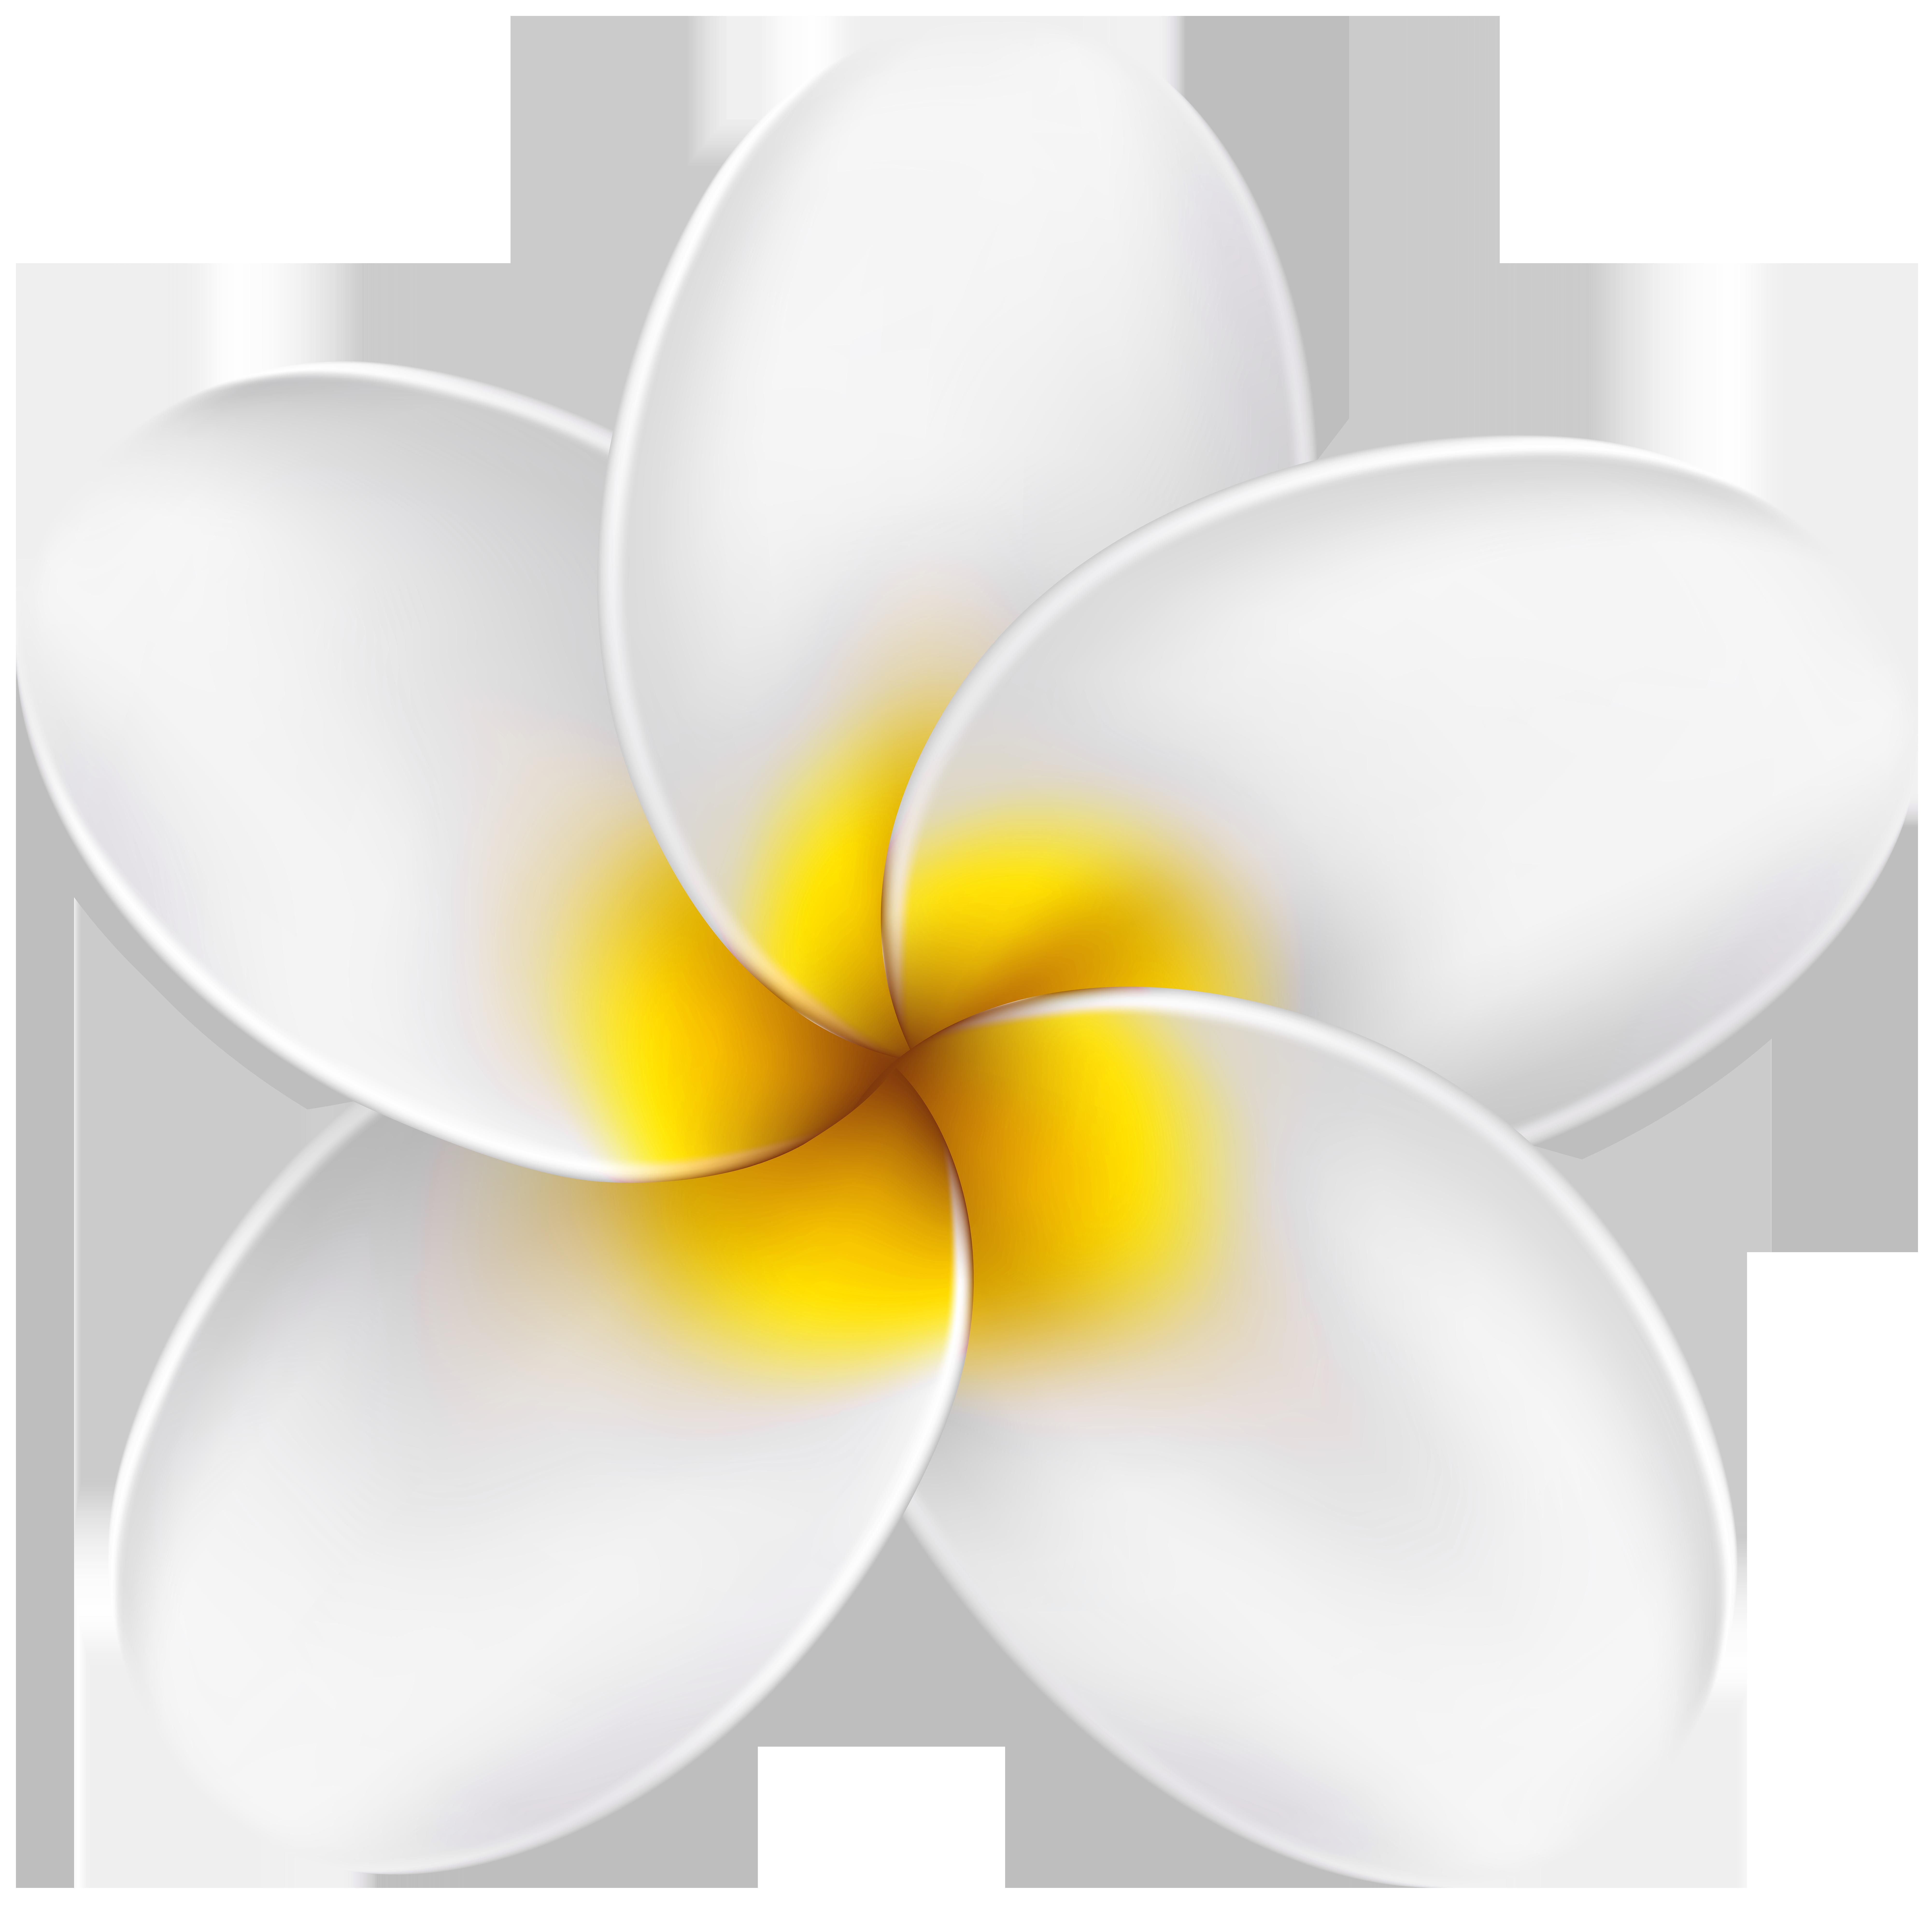 Flower clipart tropical. Clip art png image